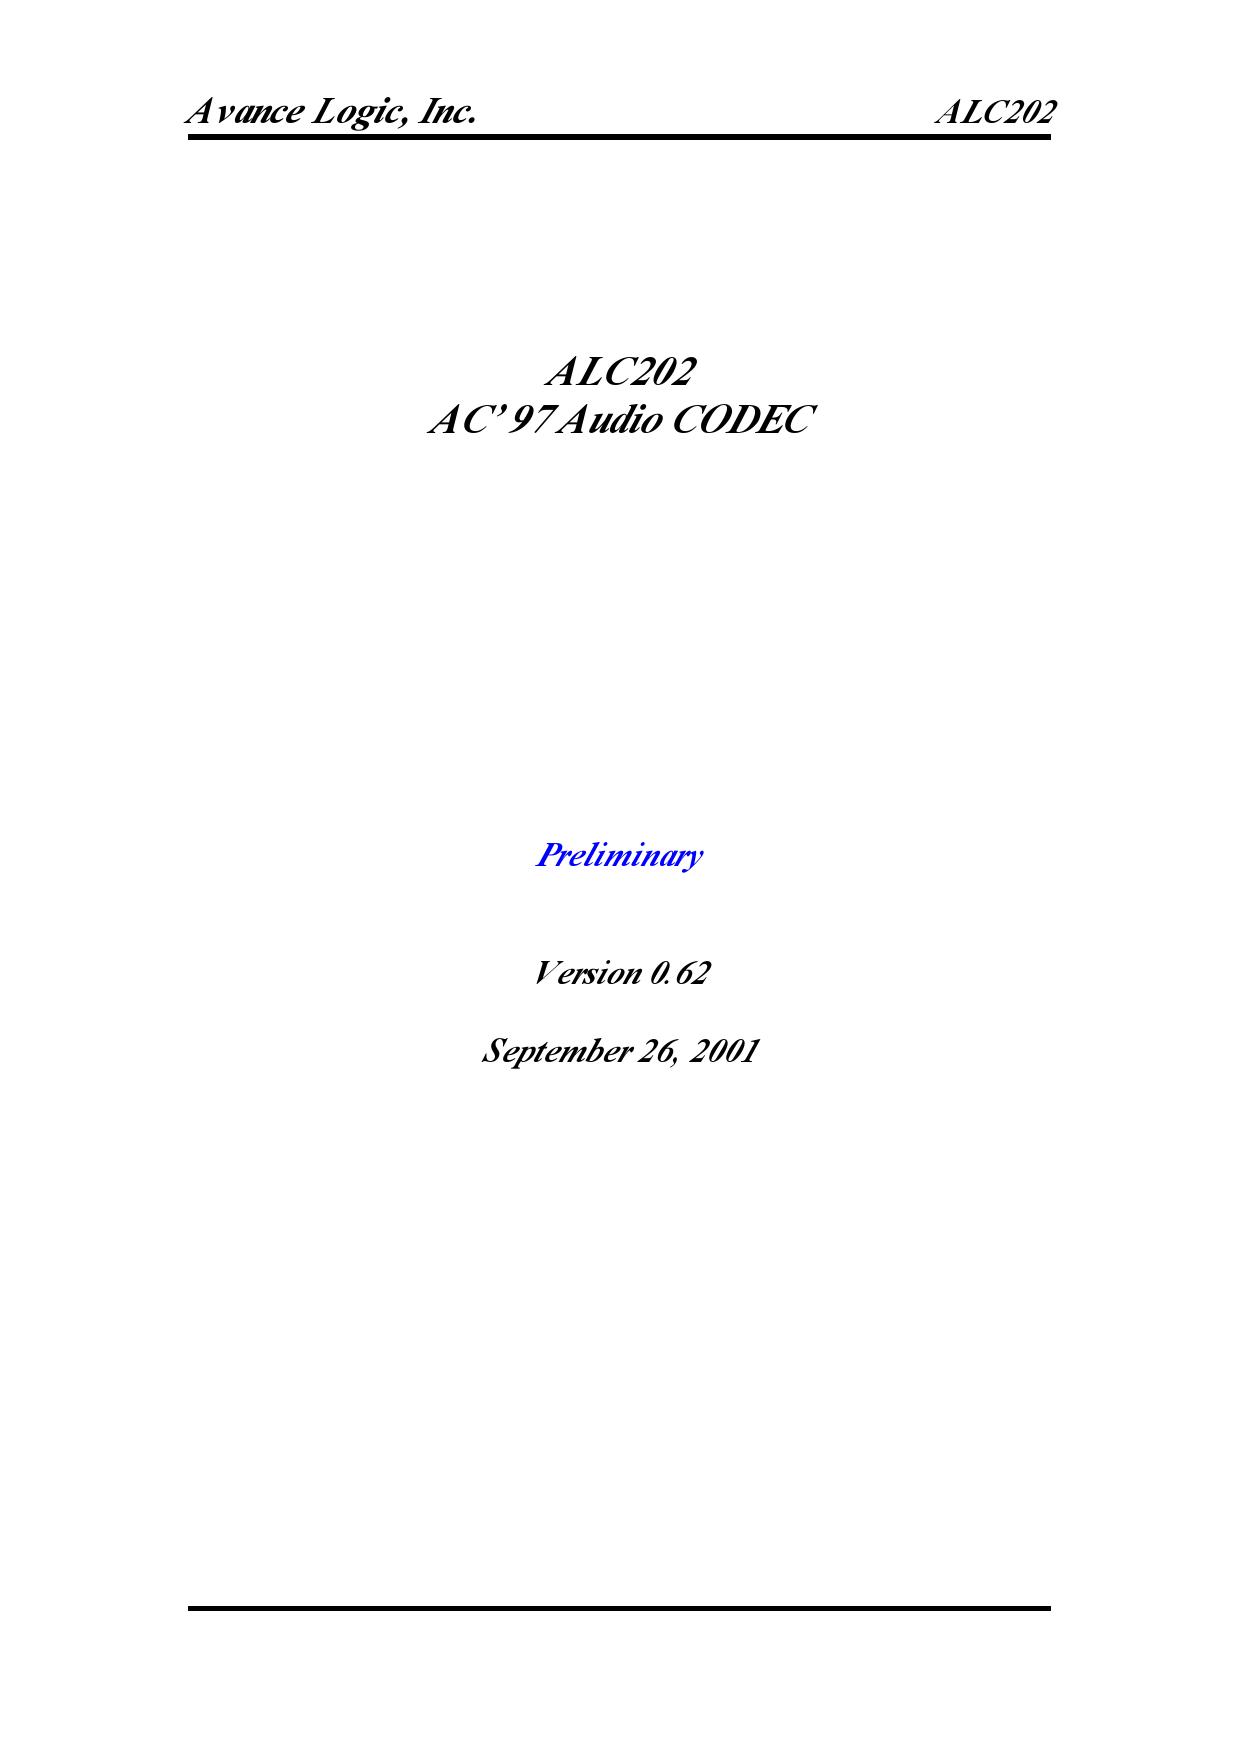 ALC202 image